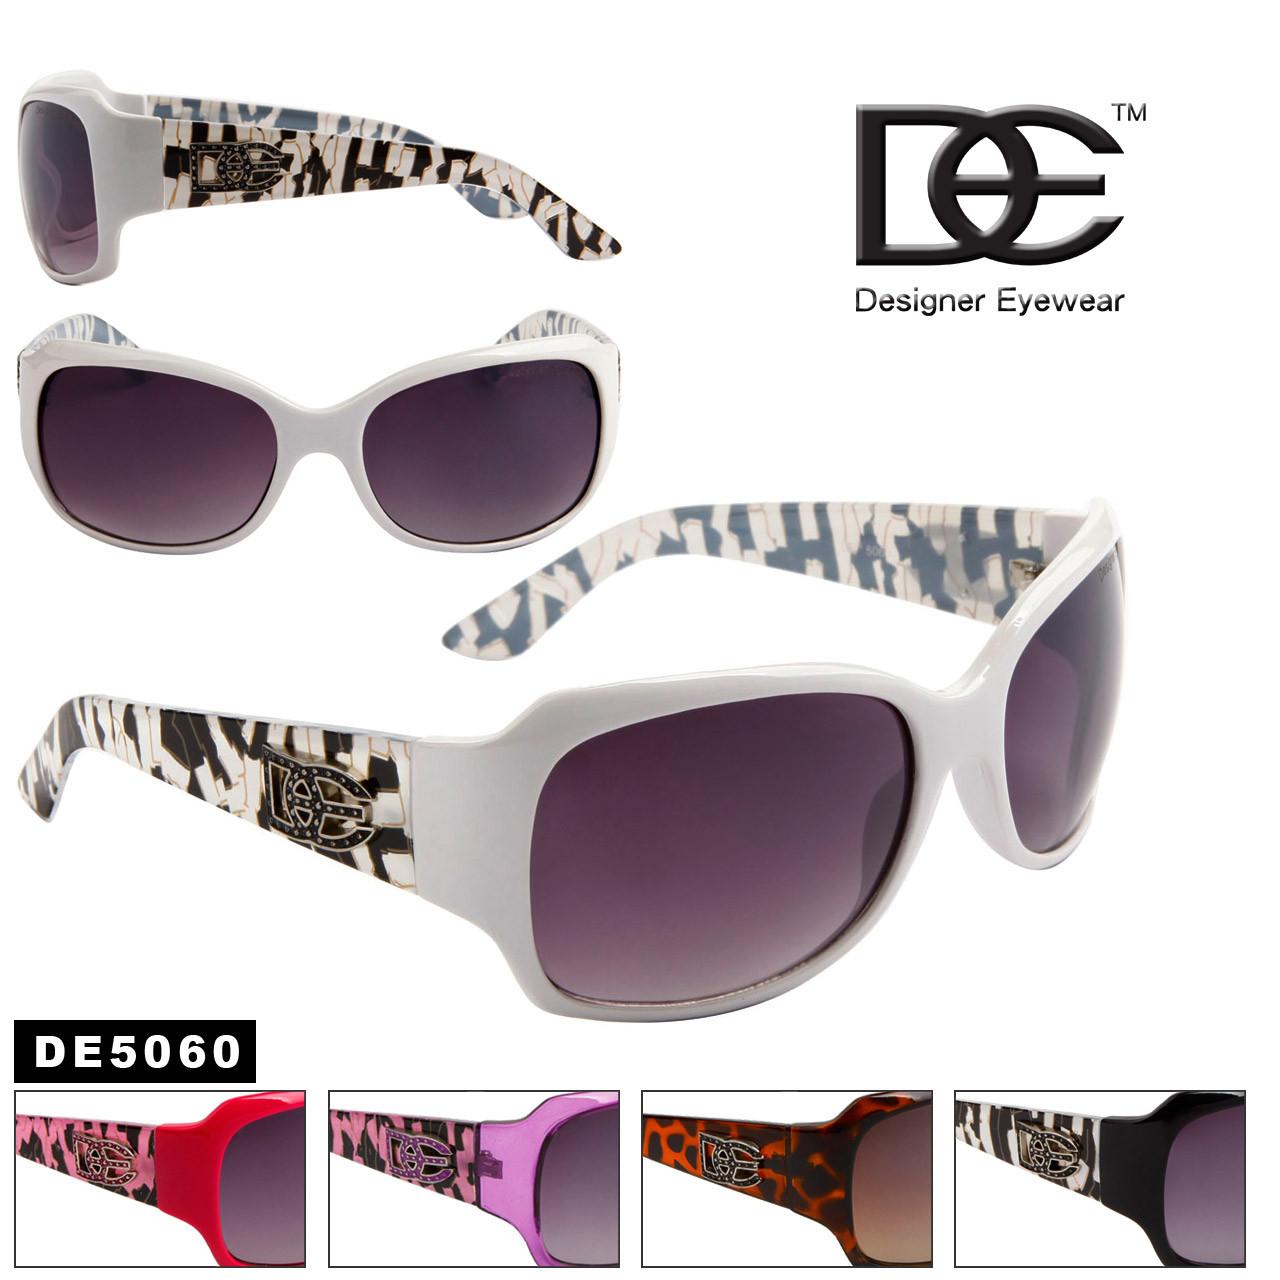 8ebeb2251 Wholesale DE™ Designer Sunglasses - Style # DE5060